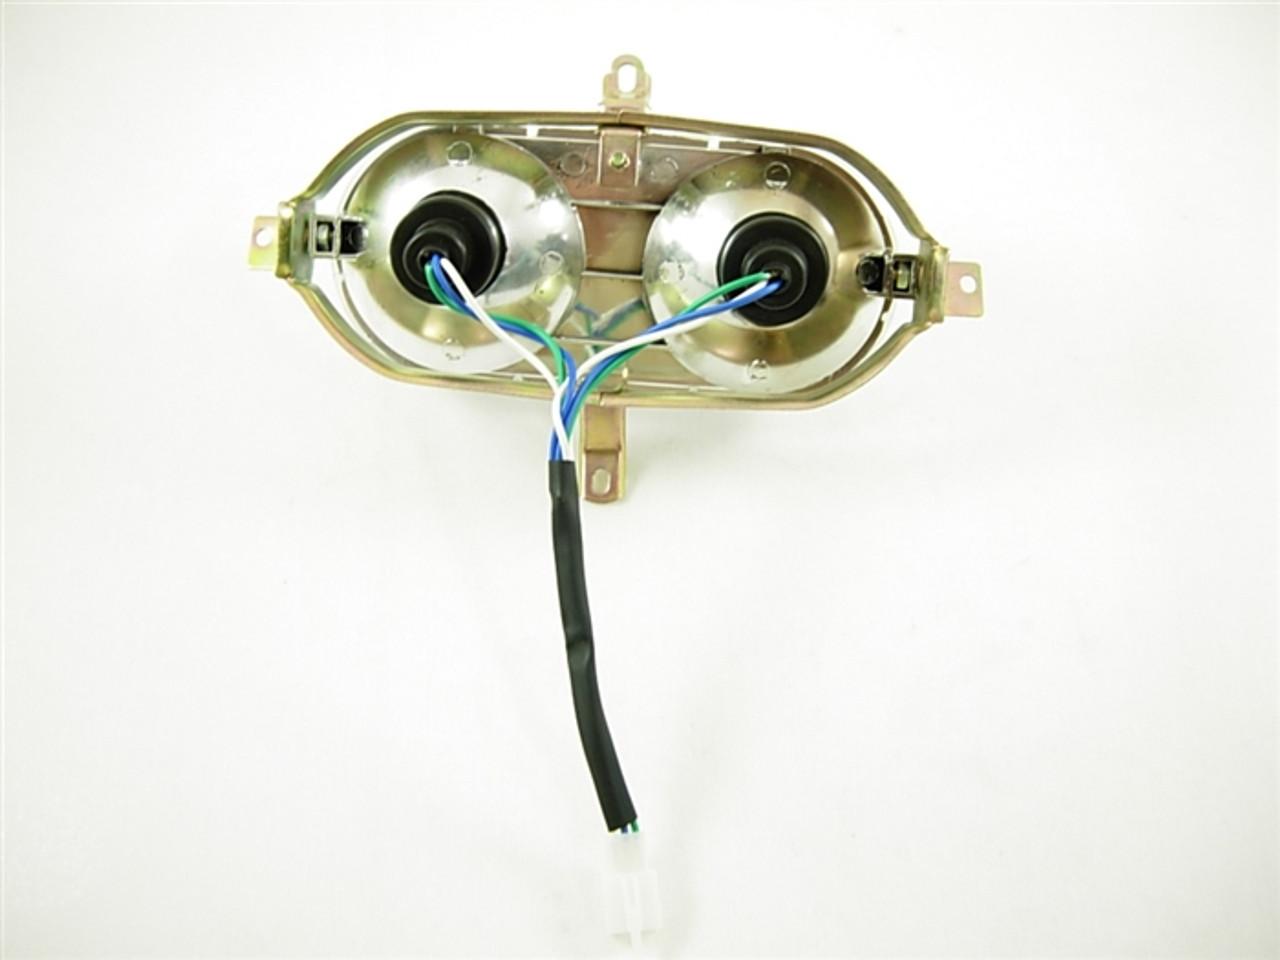 headlight assembly 11405-a79-1